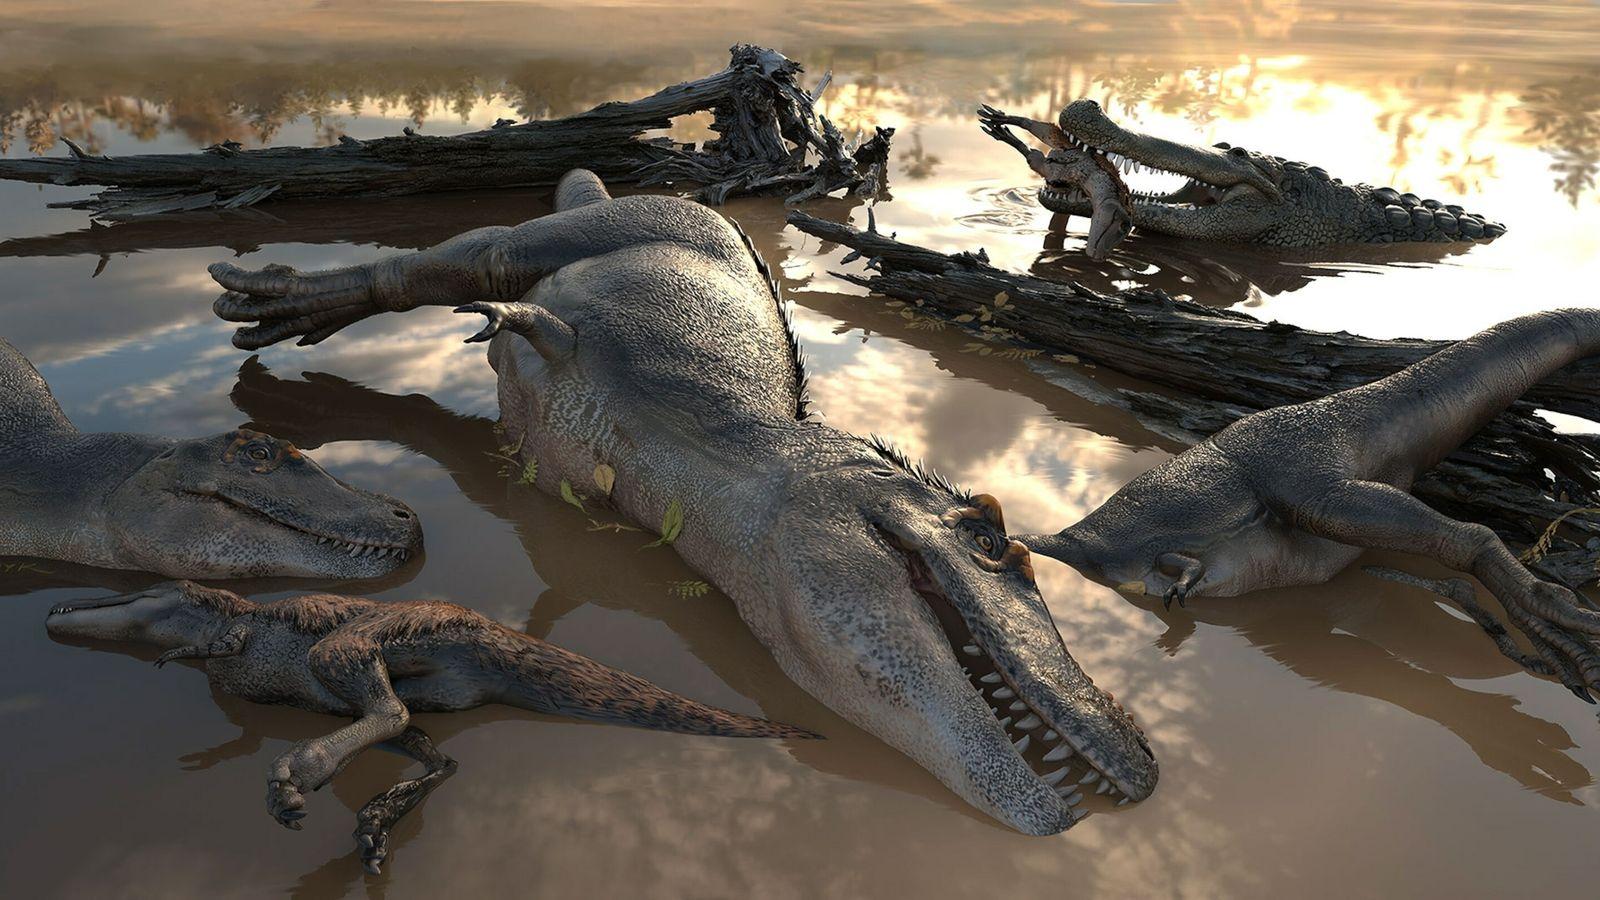 Ertrunkene Tyrannosaurier